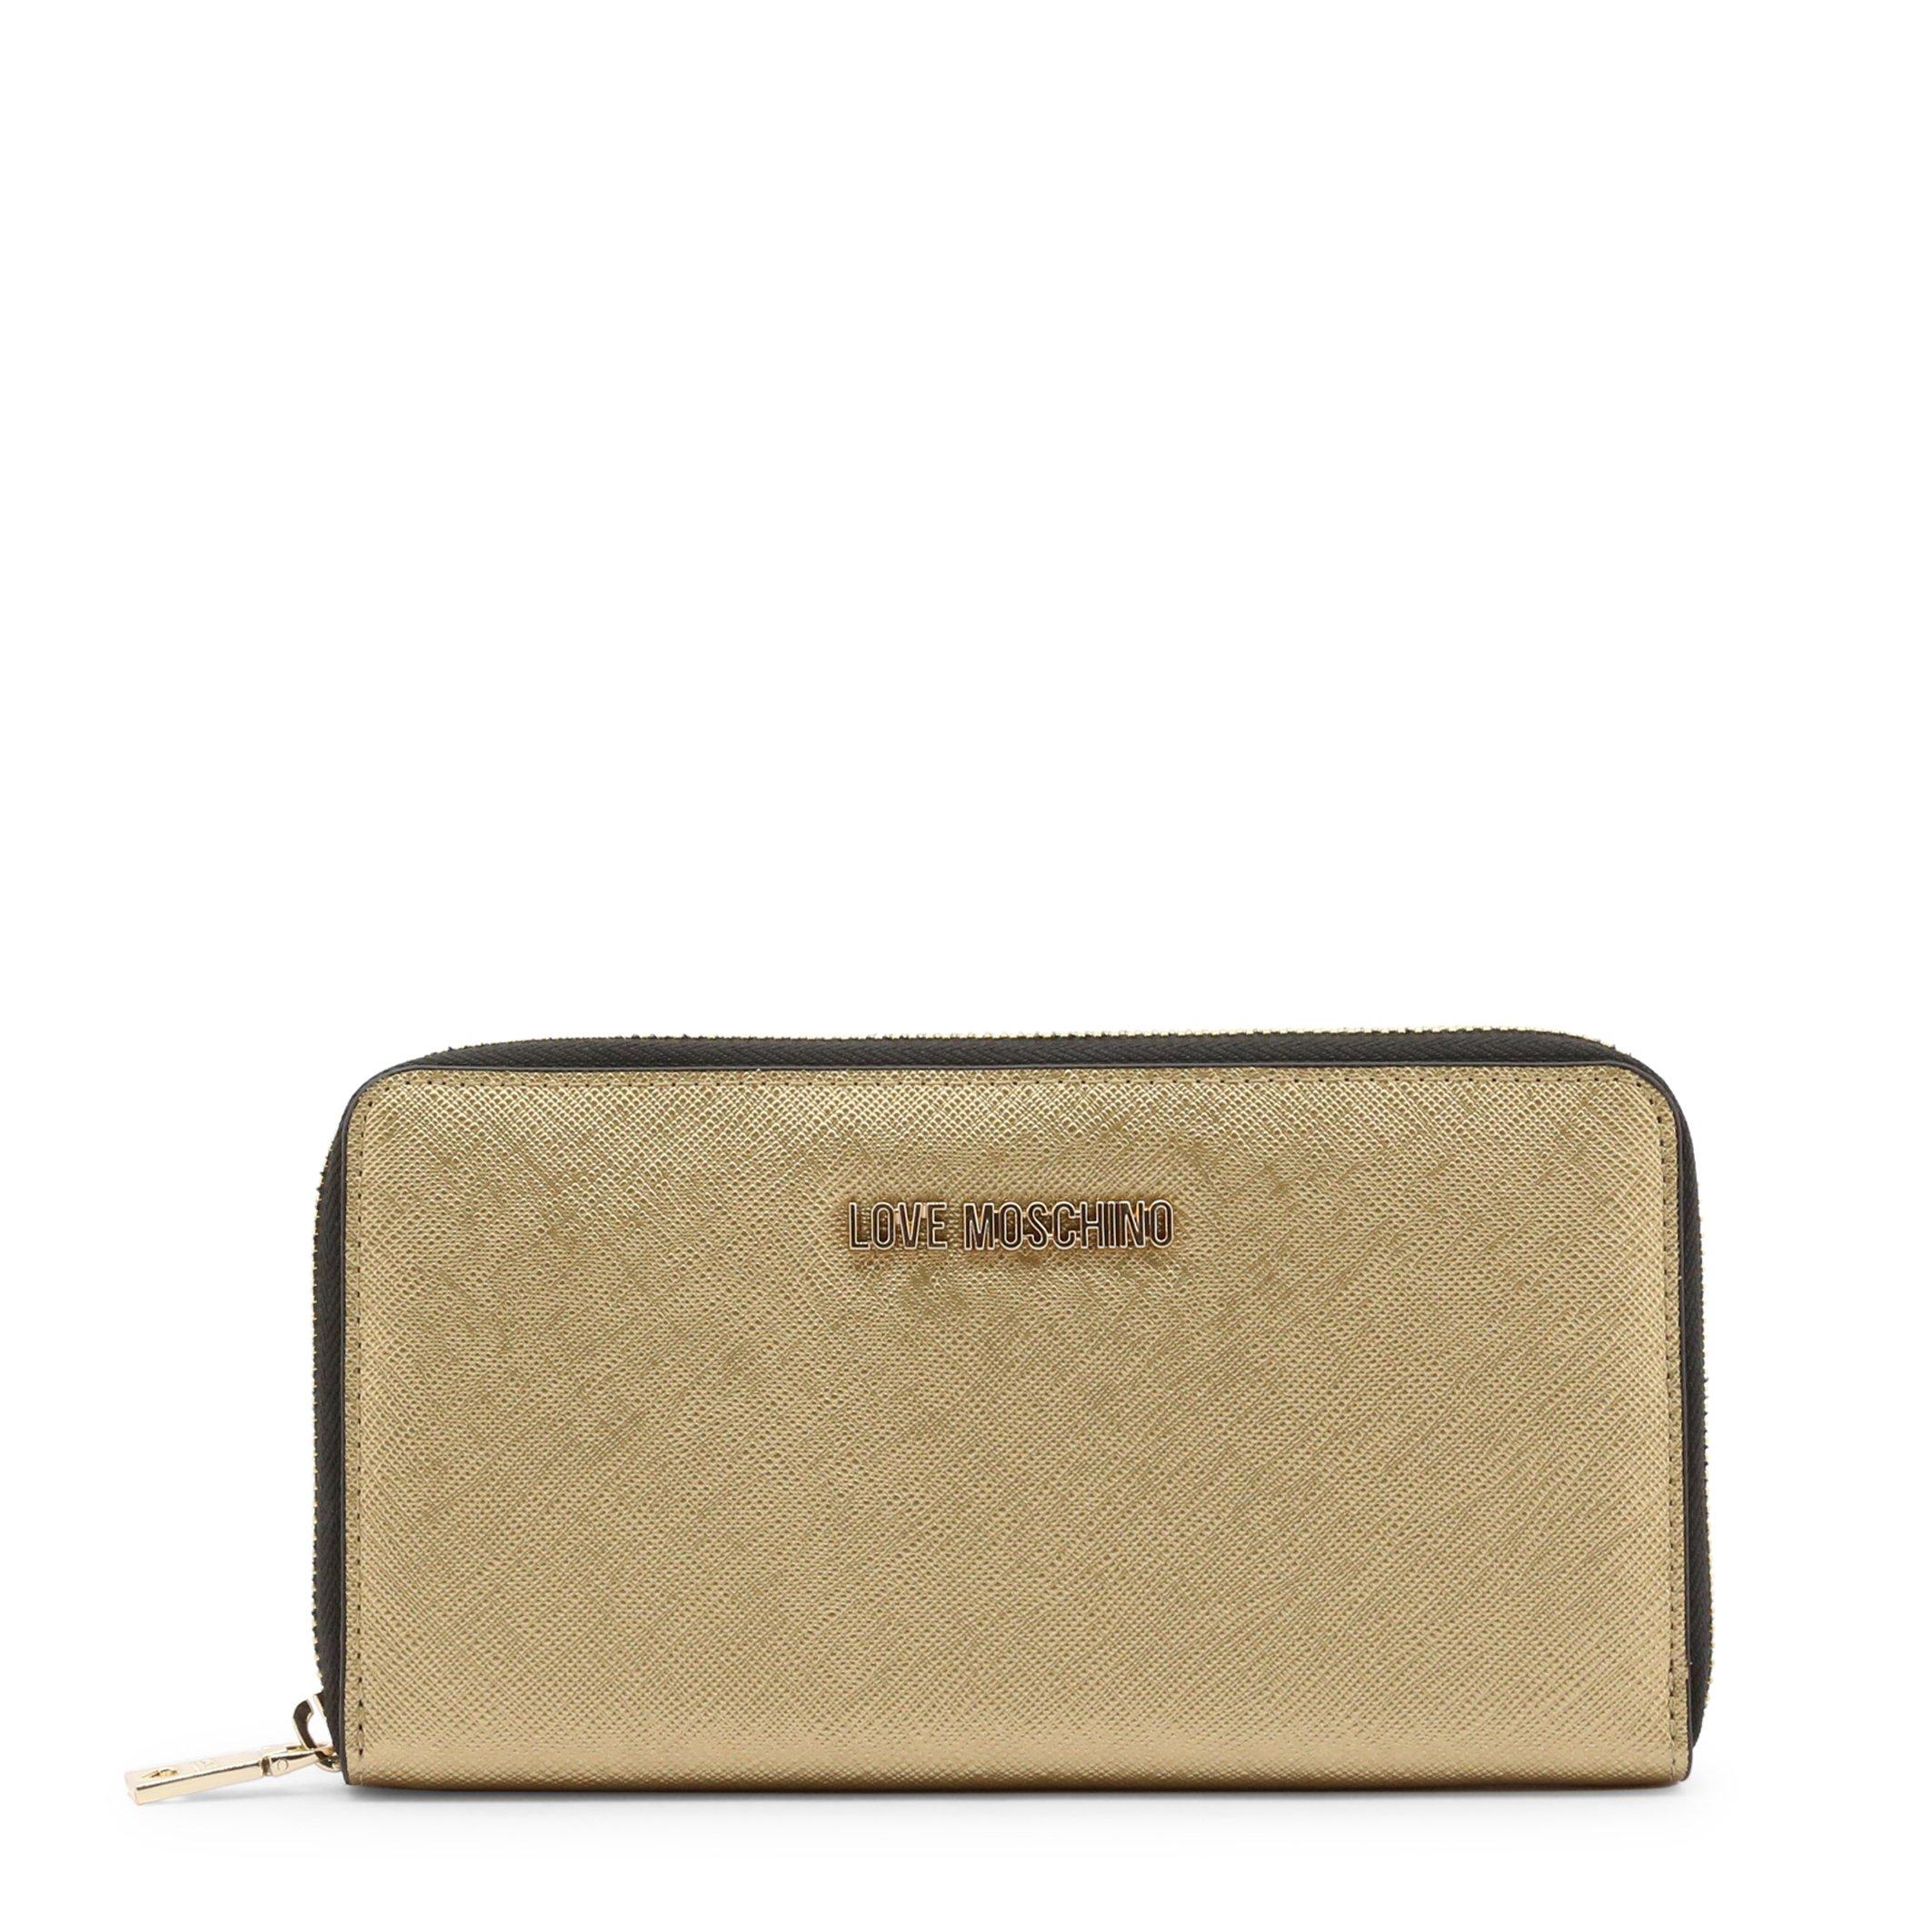 Love Moschino Women's Wallet Various Colours JC5552PP16LQ0 - yellow NOSIZE